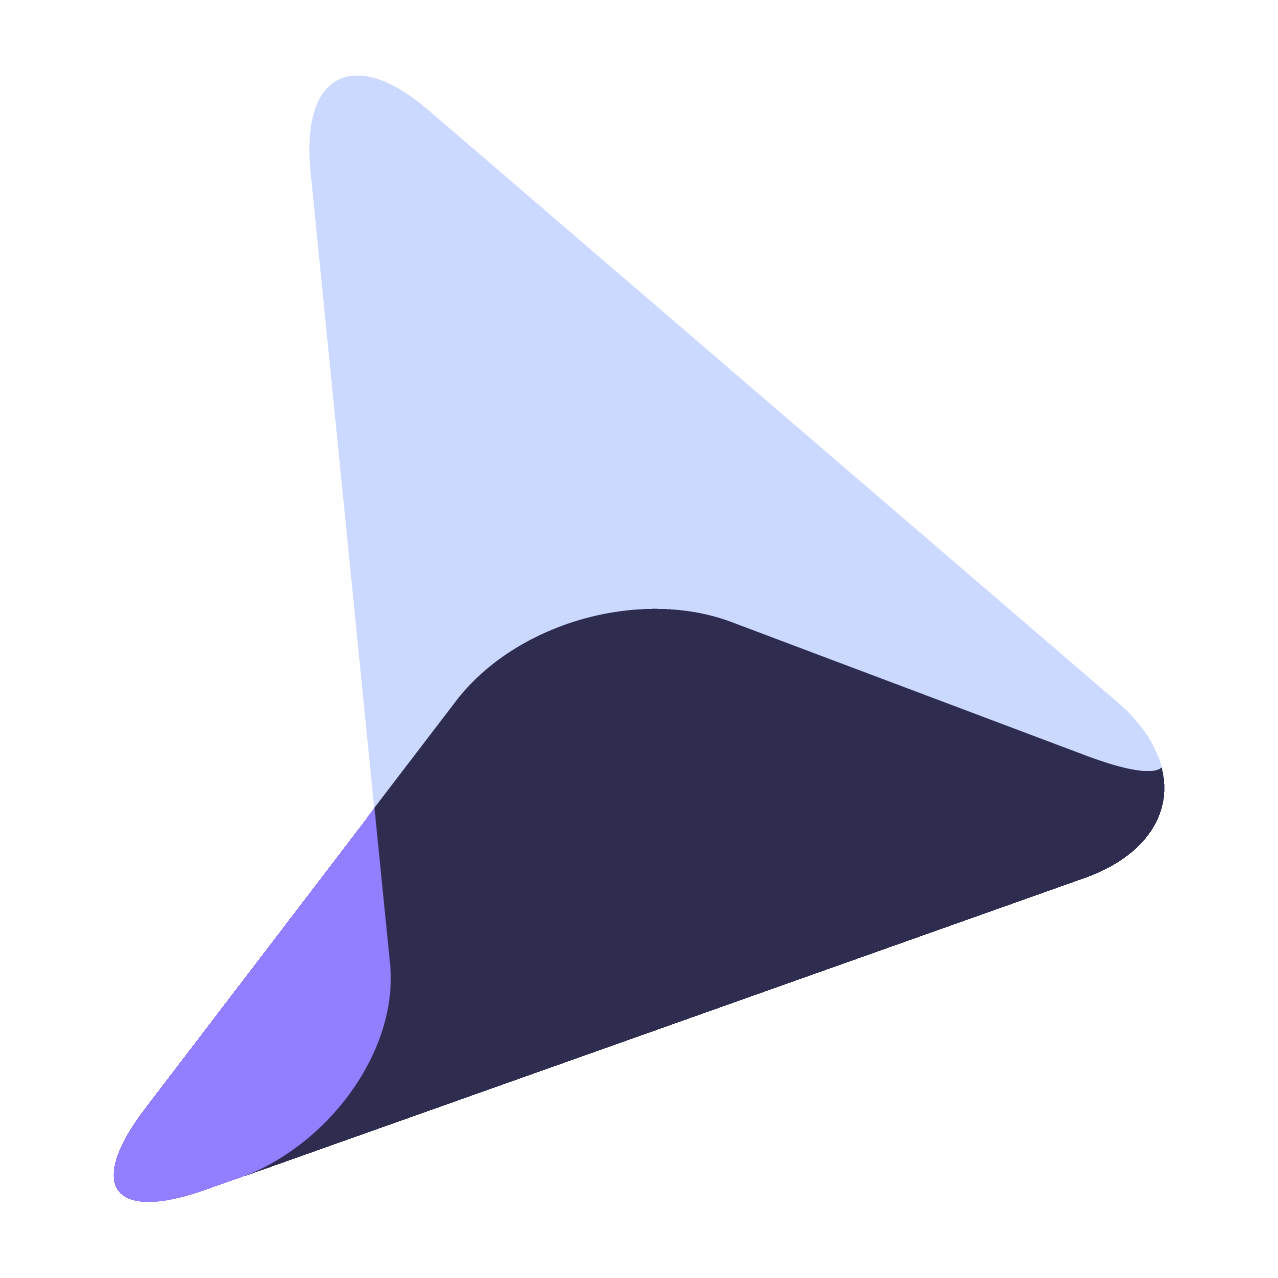 Fintiera logo - sygnet